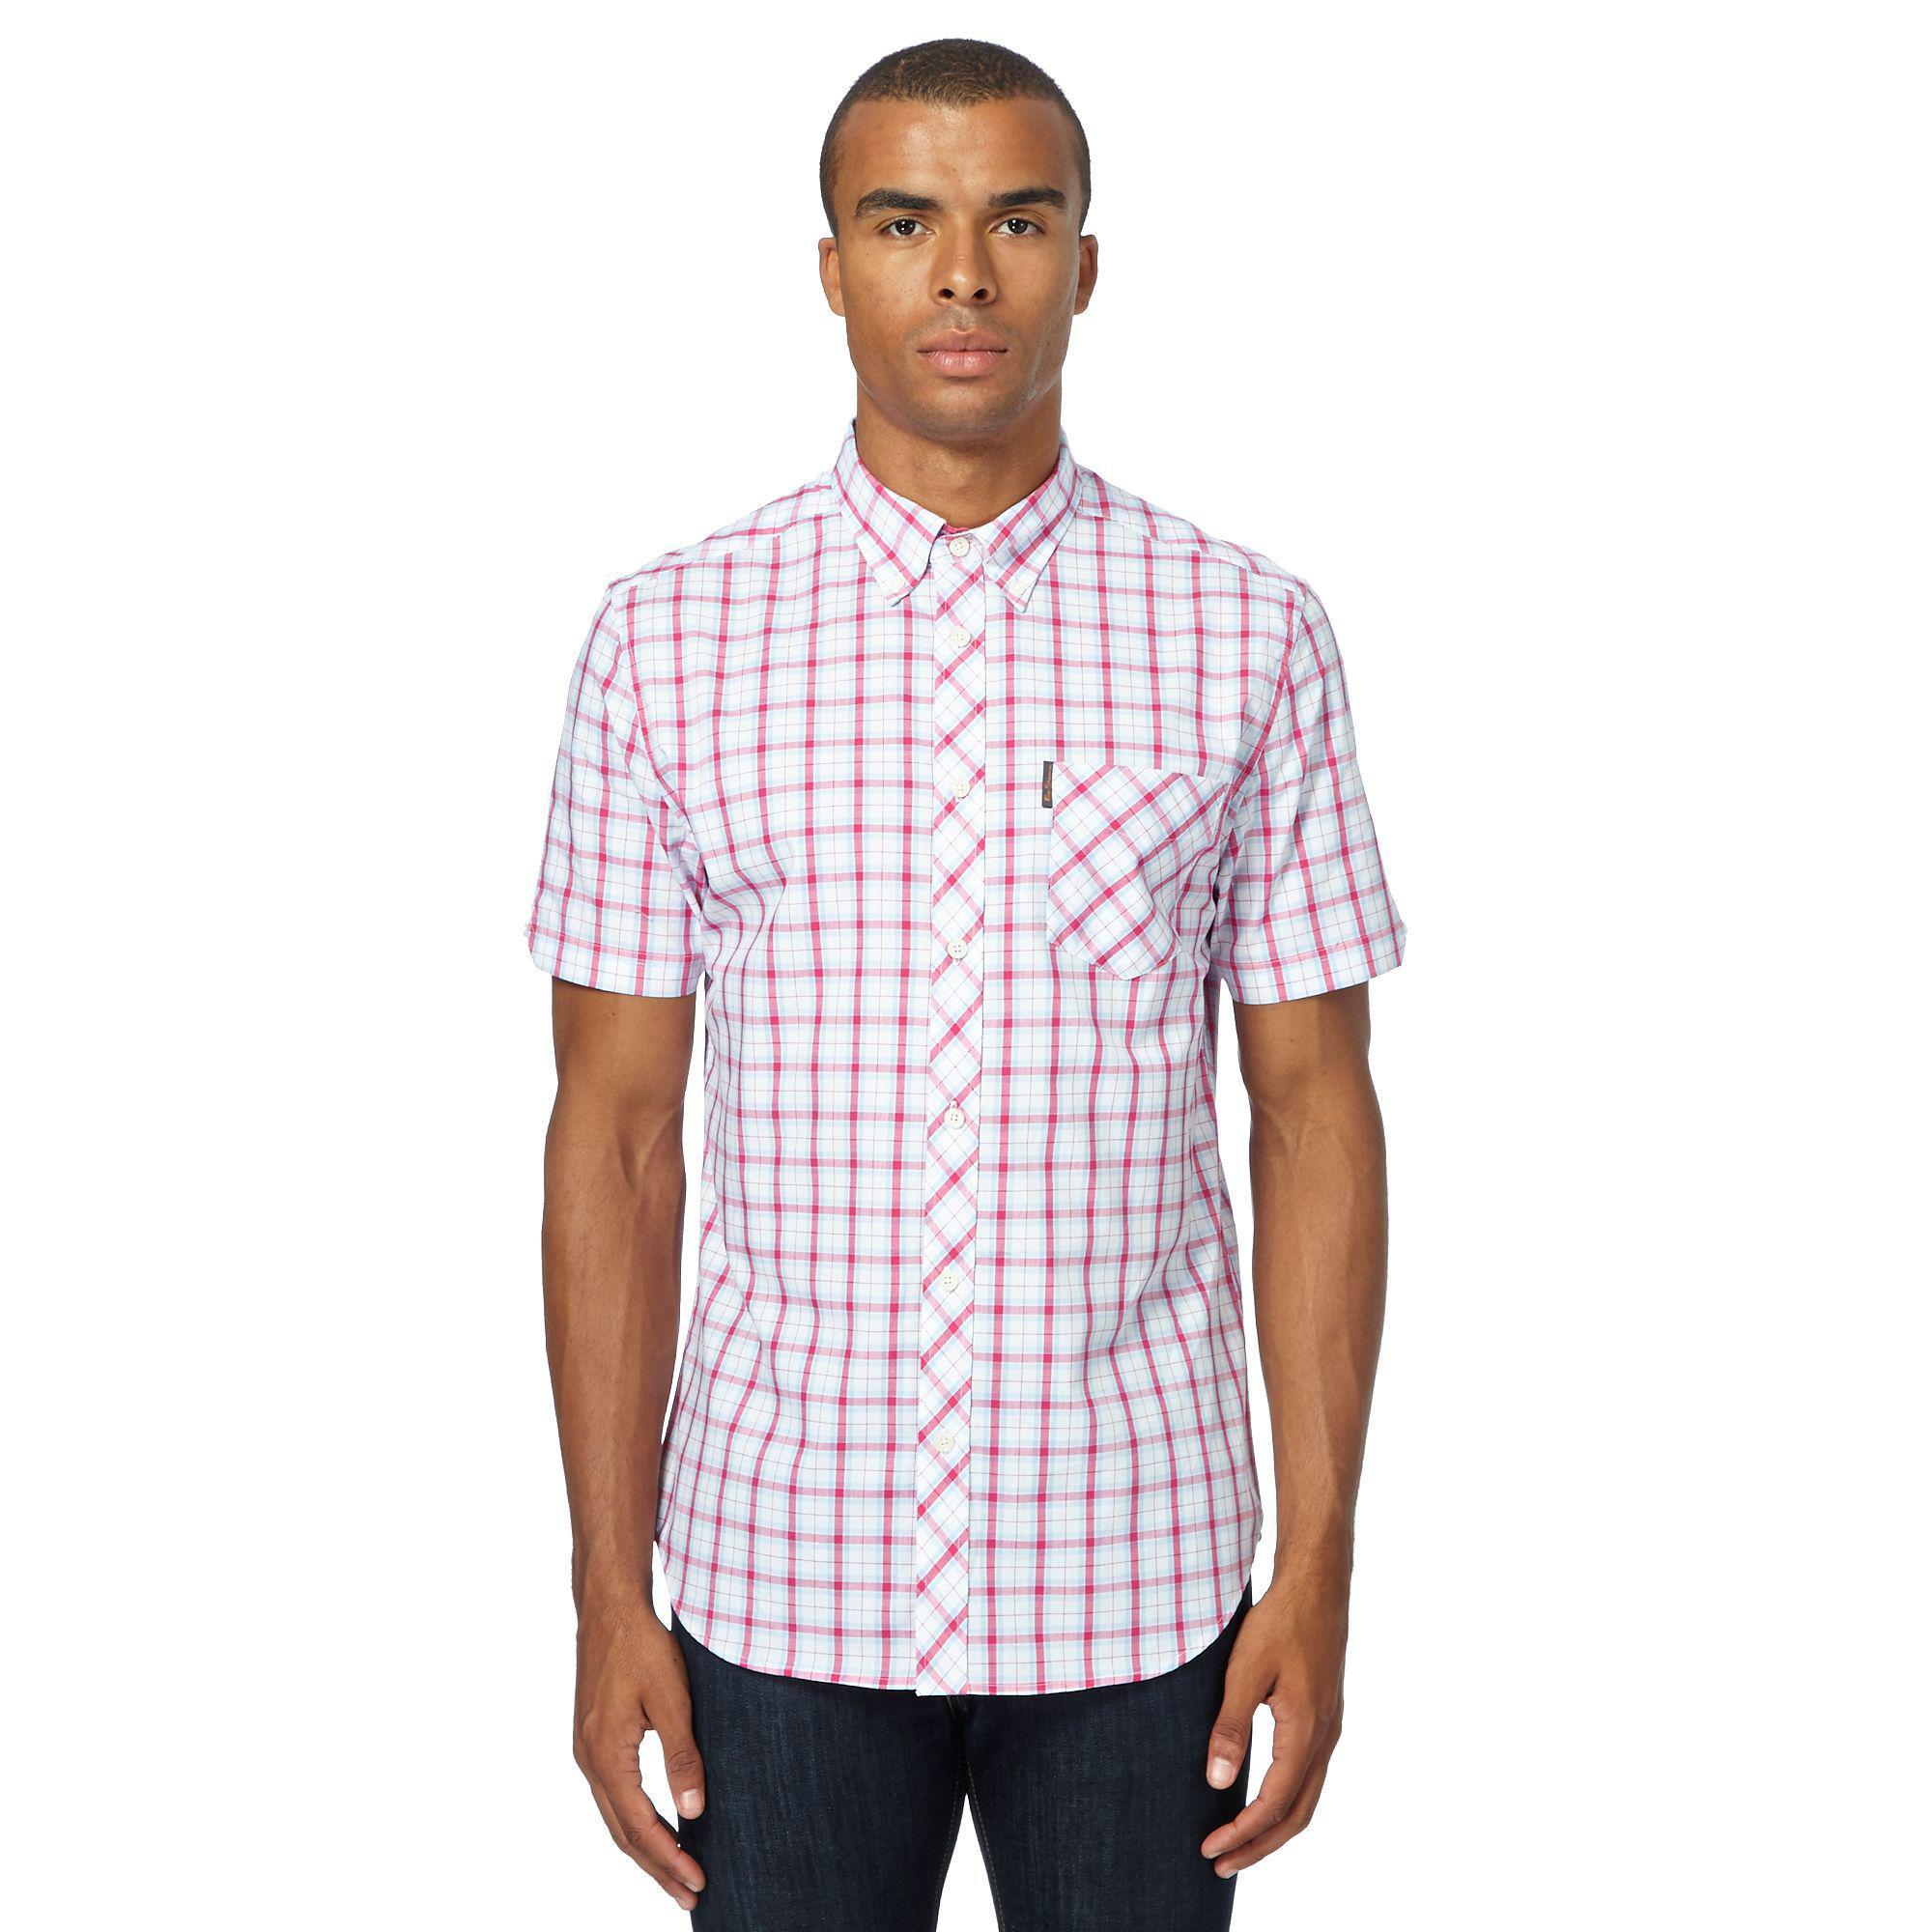 95f6e9b2b6 Ben Sherman Pink Checked Regular Fit Shirt in Pink for Men - Lyst